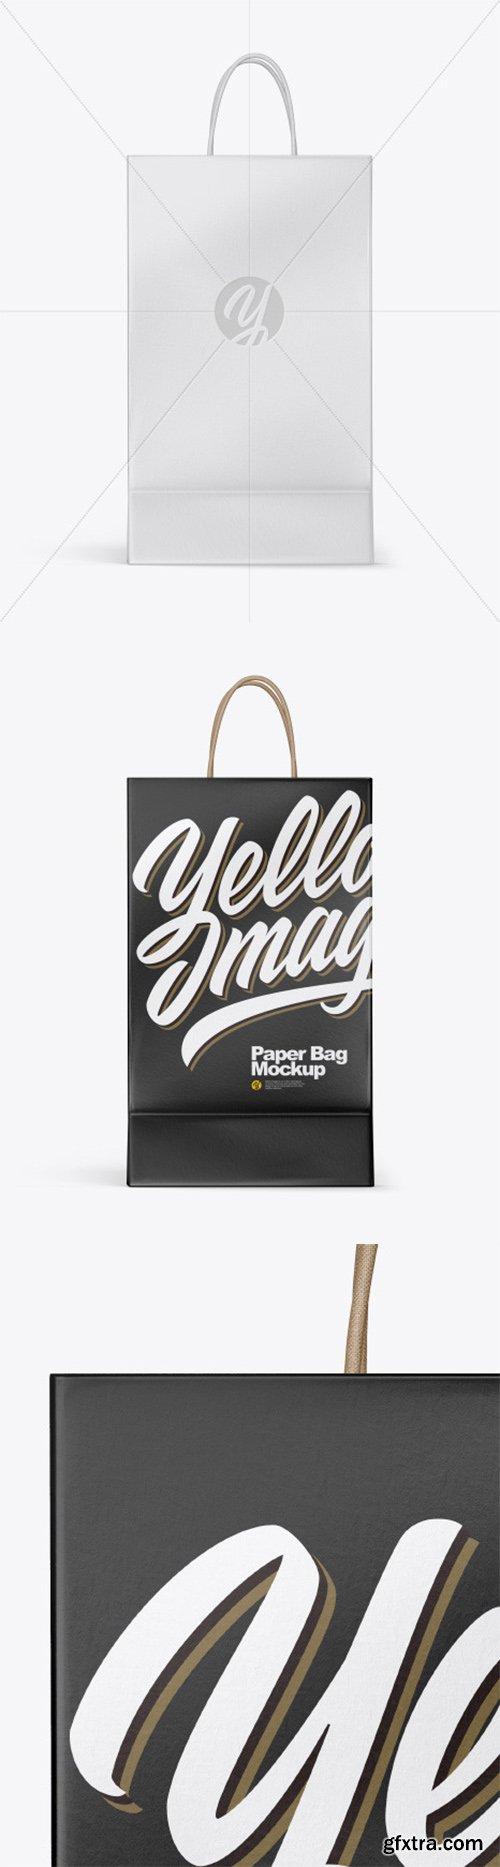 Textured Shopping Bag w/ Rope Handles Mockup 54420